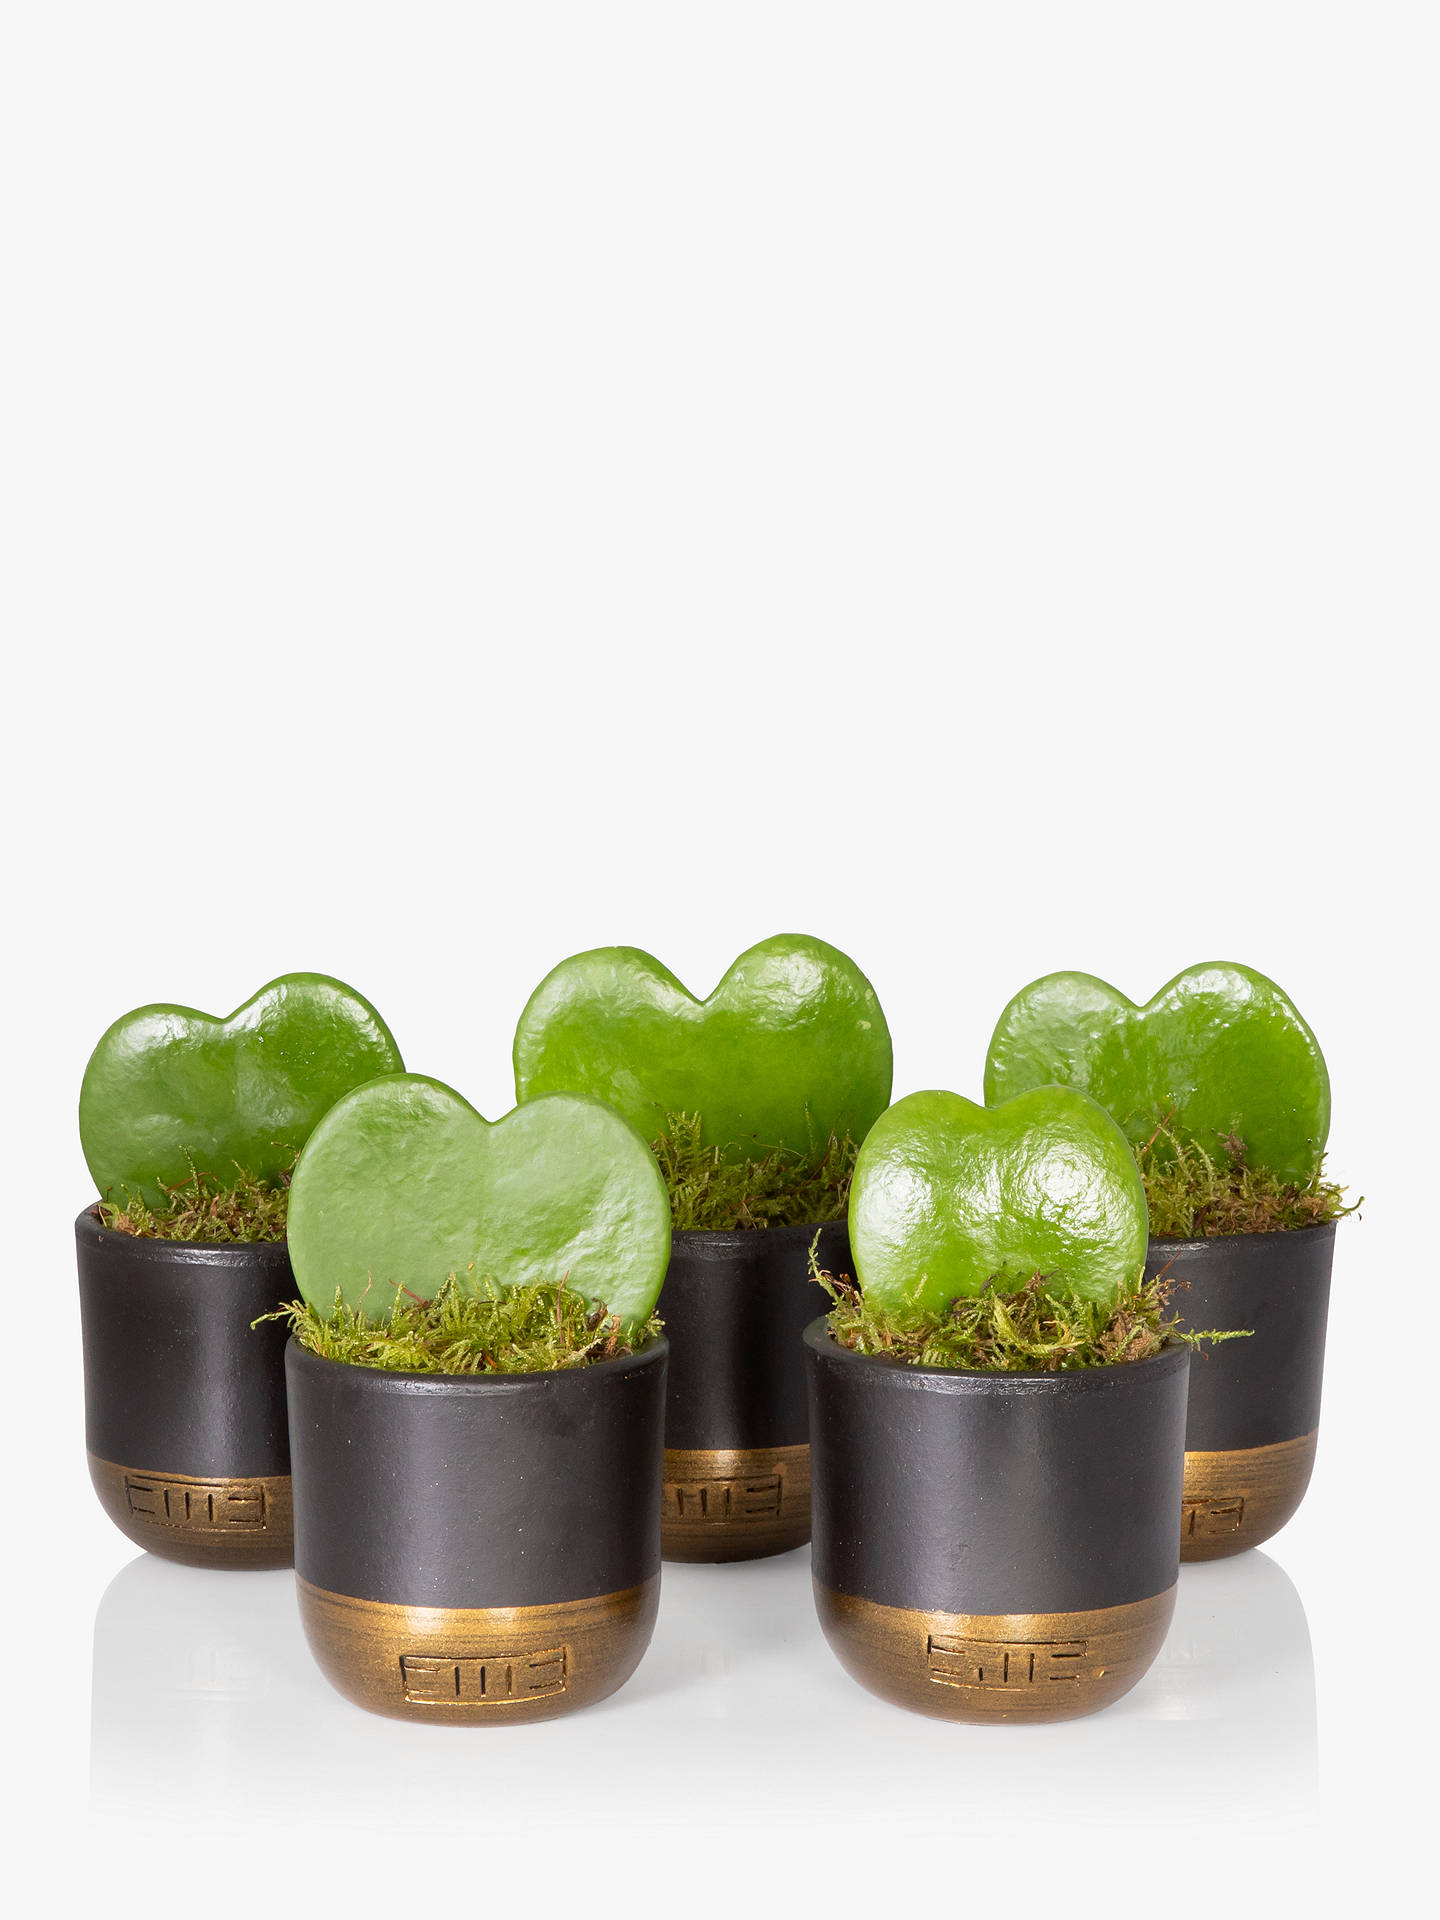 96718435 Buy The Little Botanical Bundle of Hearts Plant Online at johnlewis.com ...